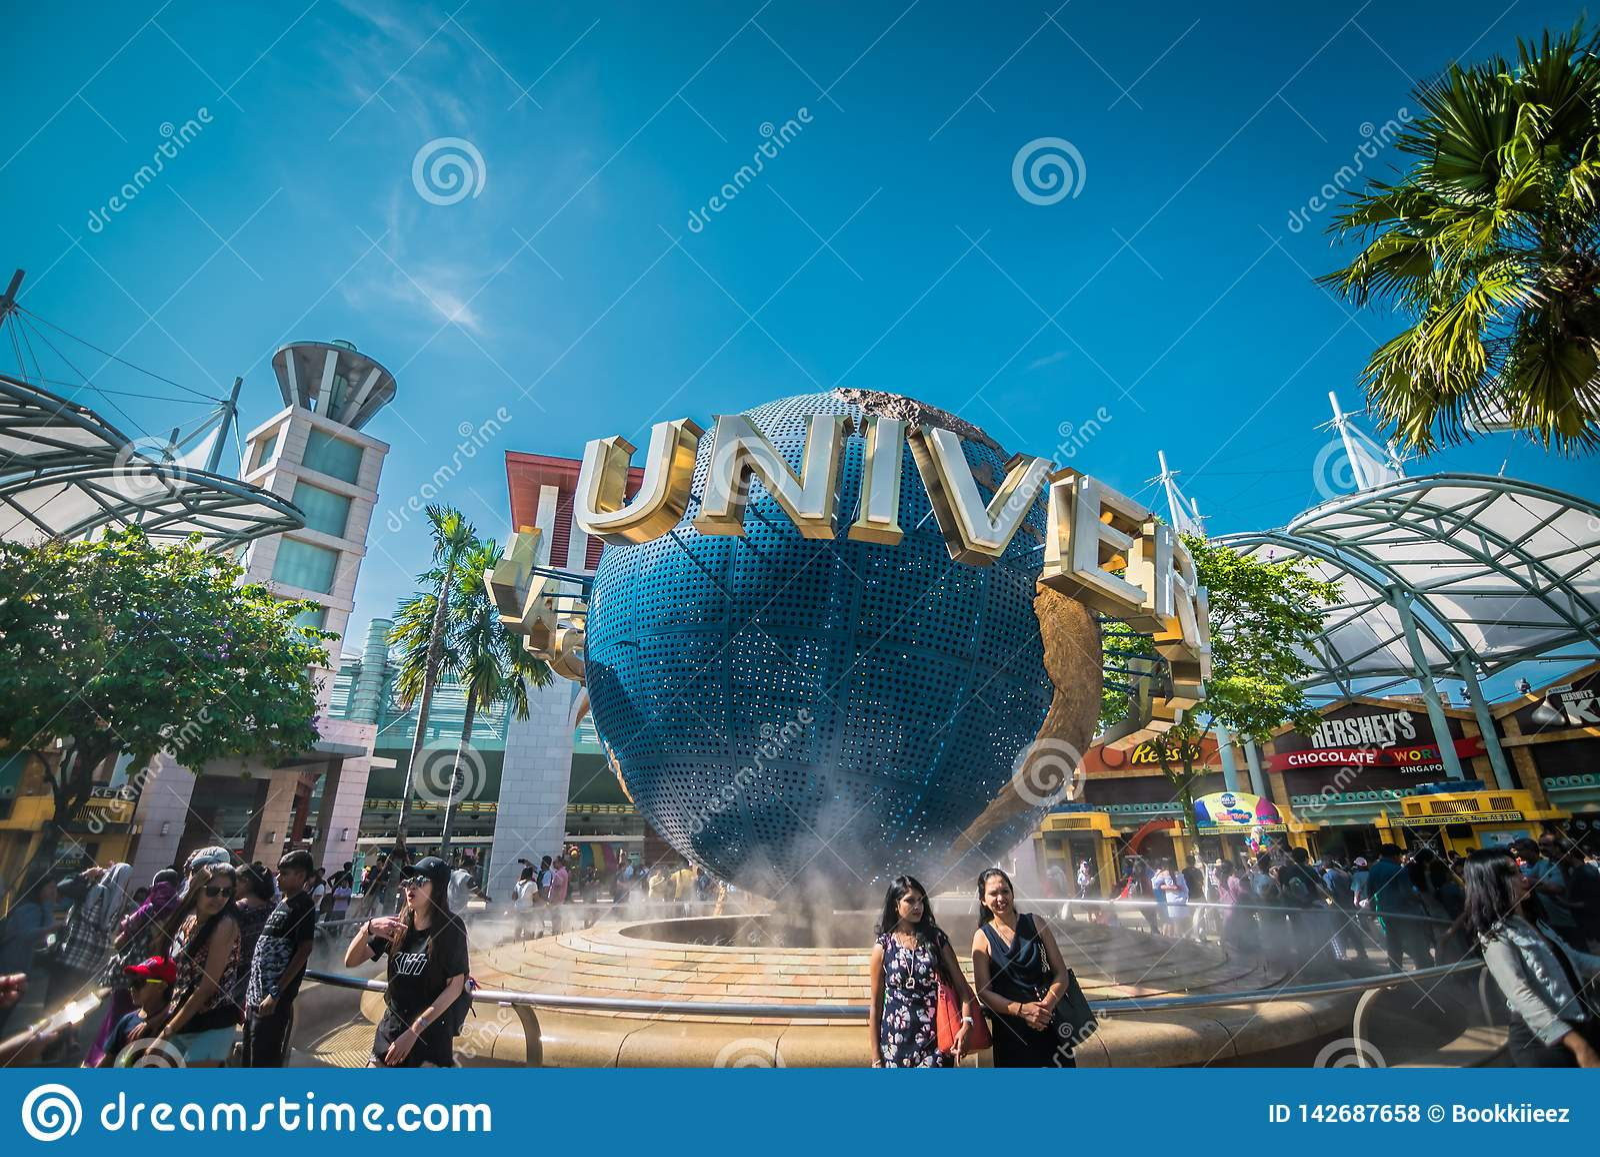 Universele die Studio Singapore, een themapark binnen Toevluchtwereld Sentosa wordt gevestigd op Sentosa-Eiland, Singapor